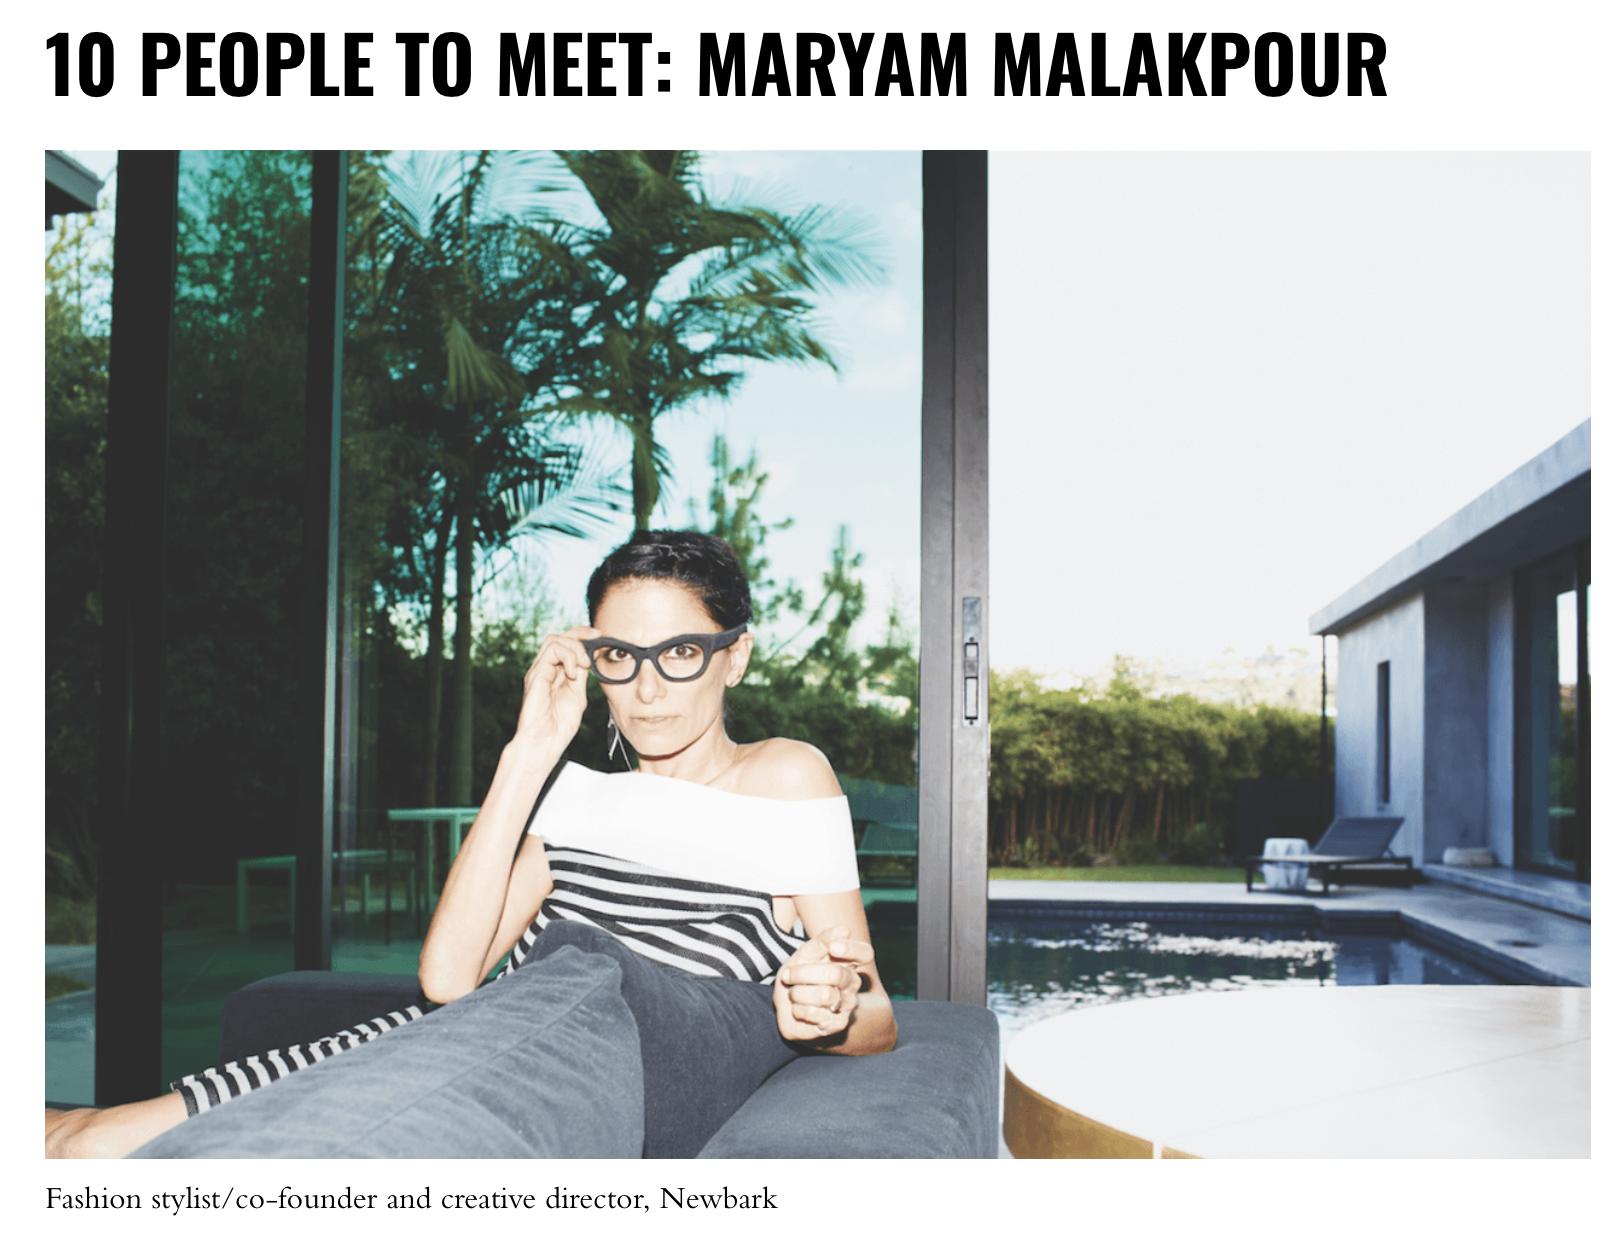 10 Magazine - 10 PEOPLE TO MEETphoto: Maria Ziegelboeckread more